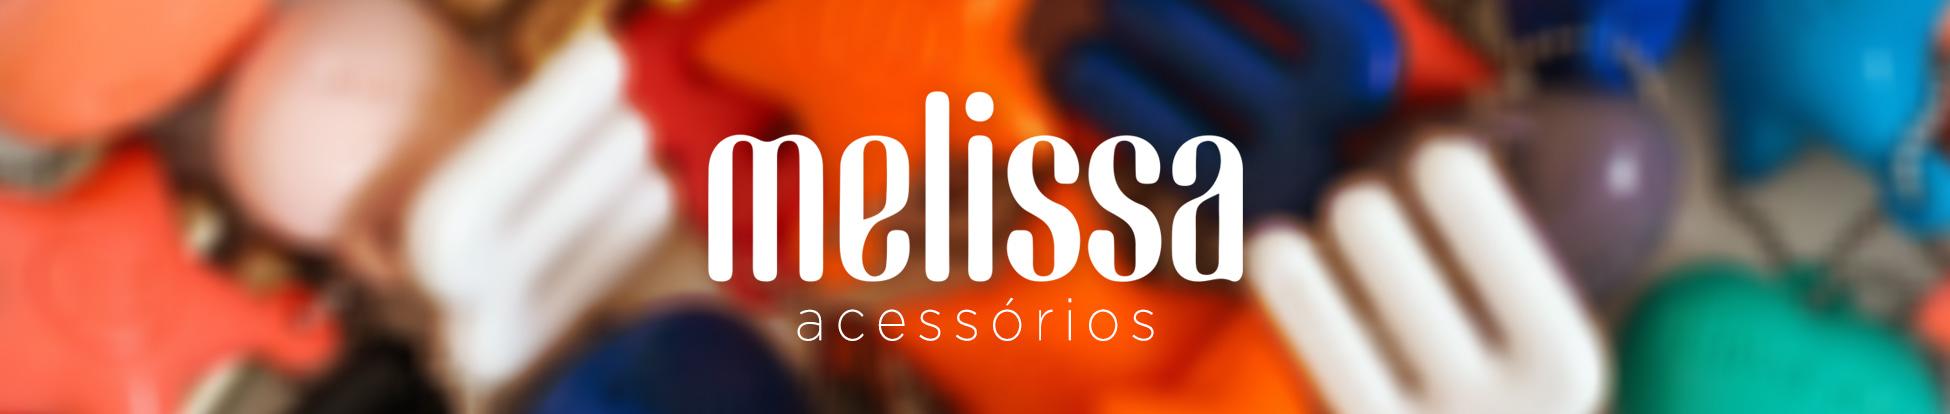 Melissa - Acessórios